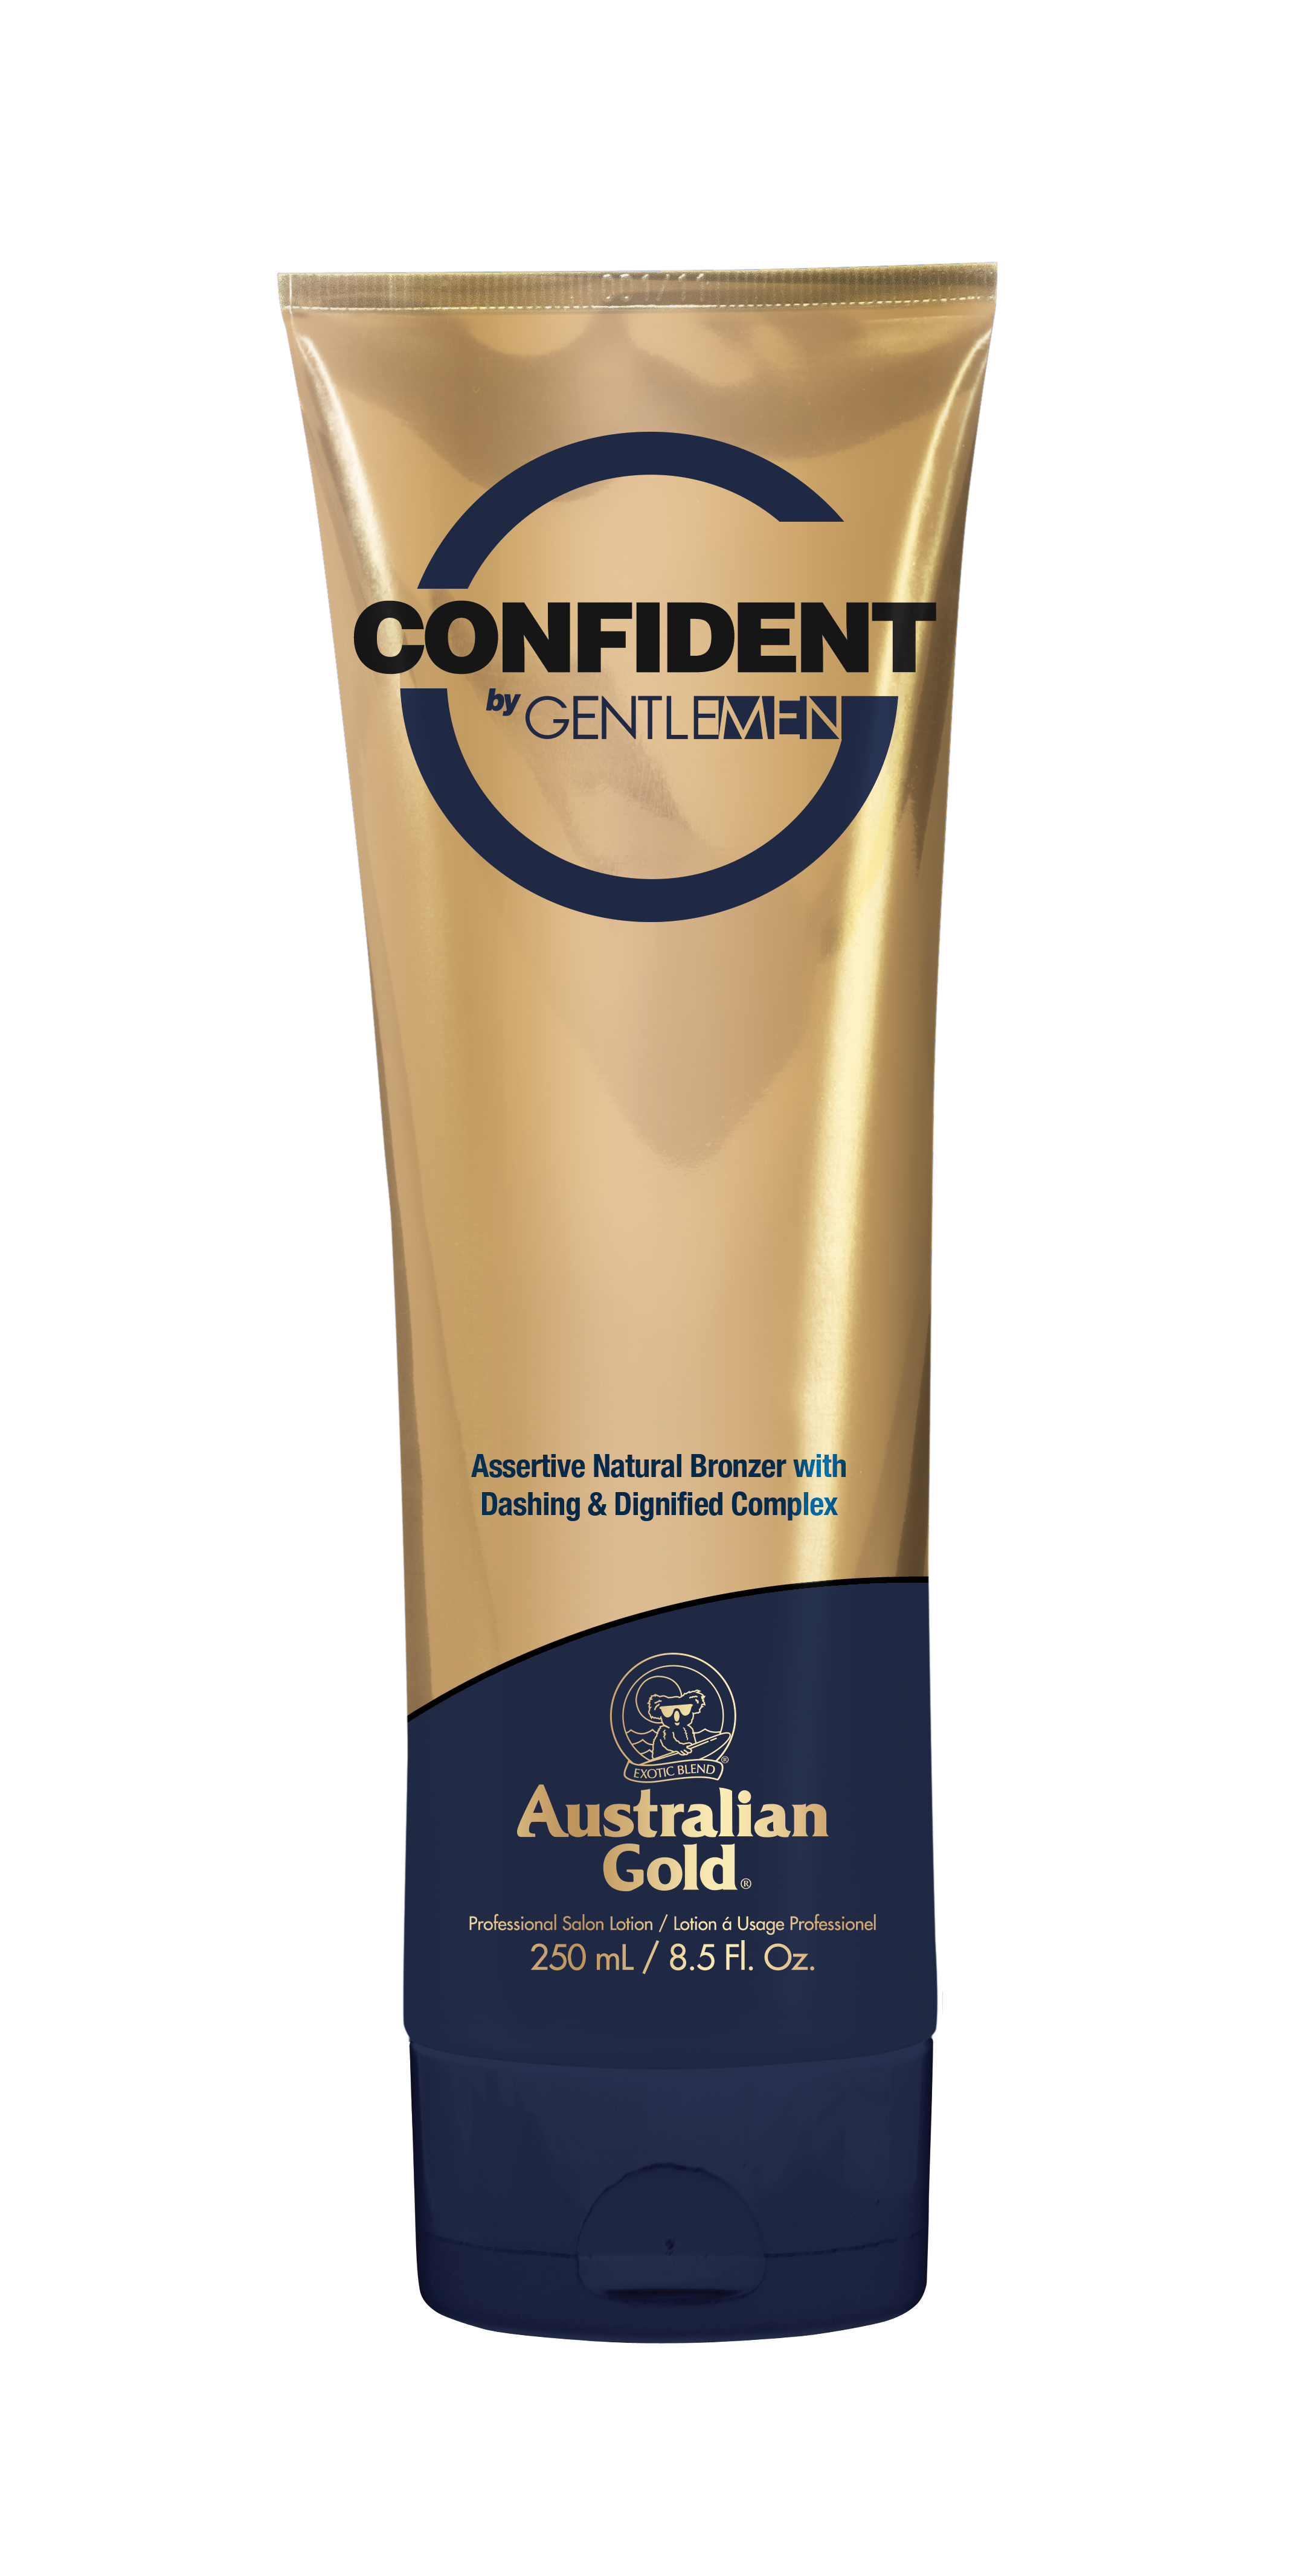 Australian Gold - Confident by G Gentlemen Bronzing Lotion 250 ml